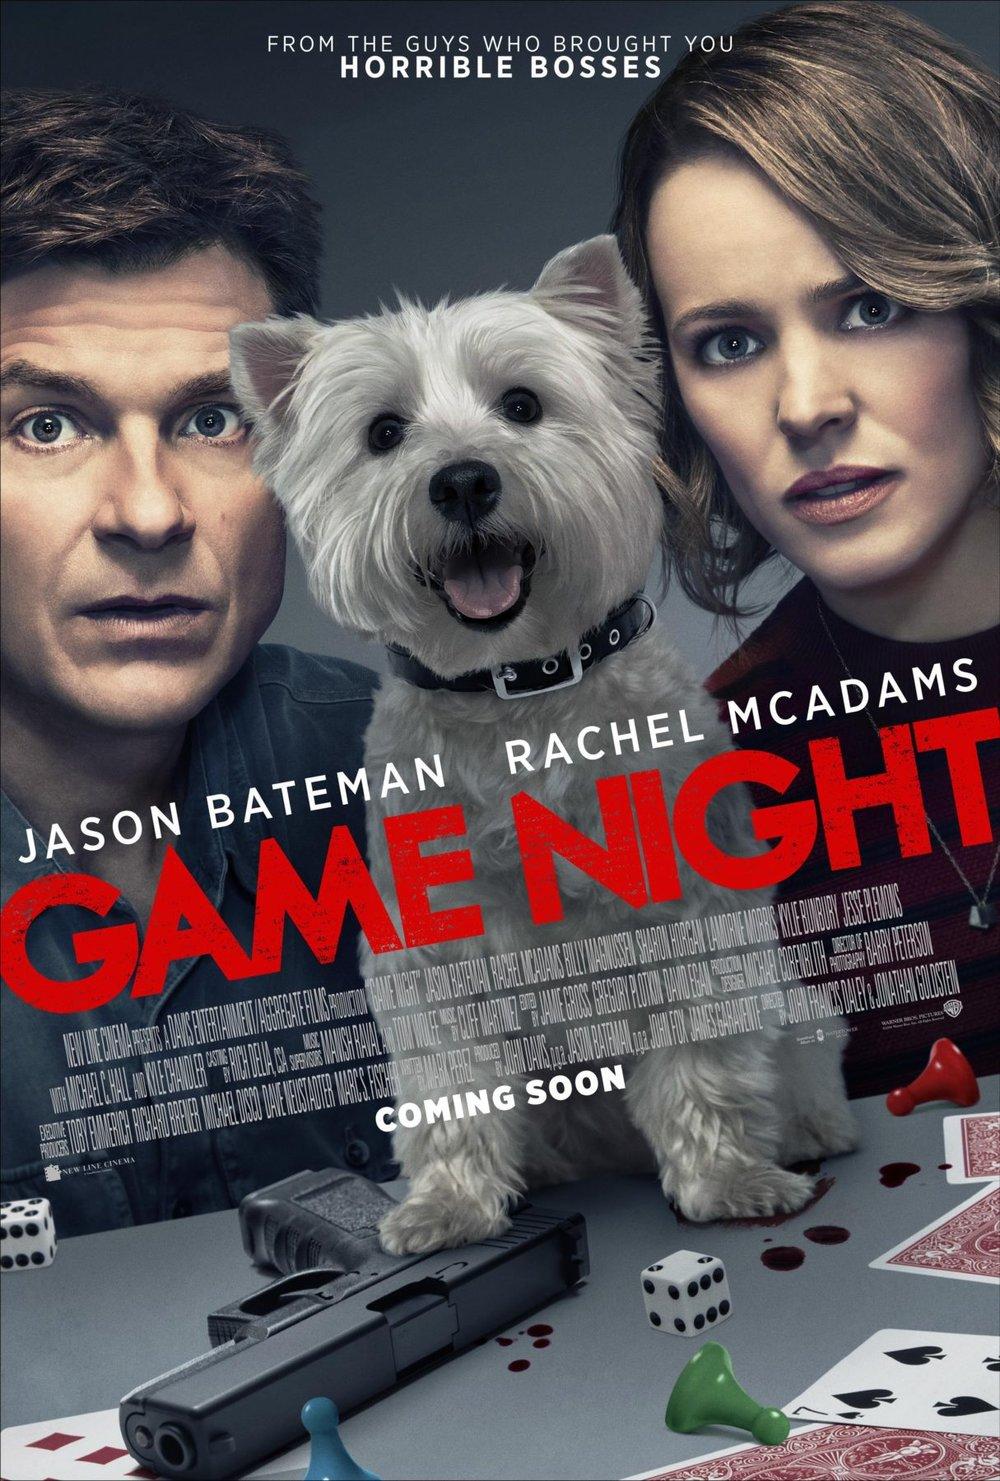 Game-Night-New-film-poster.jpg